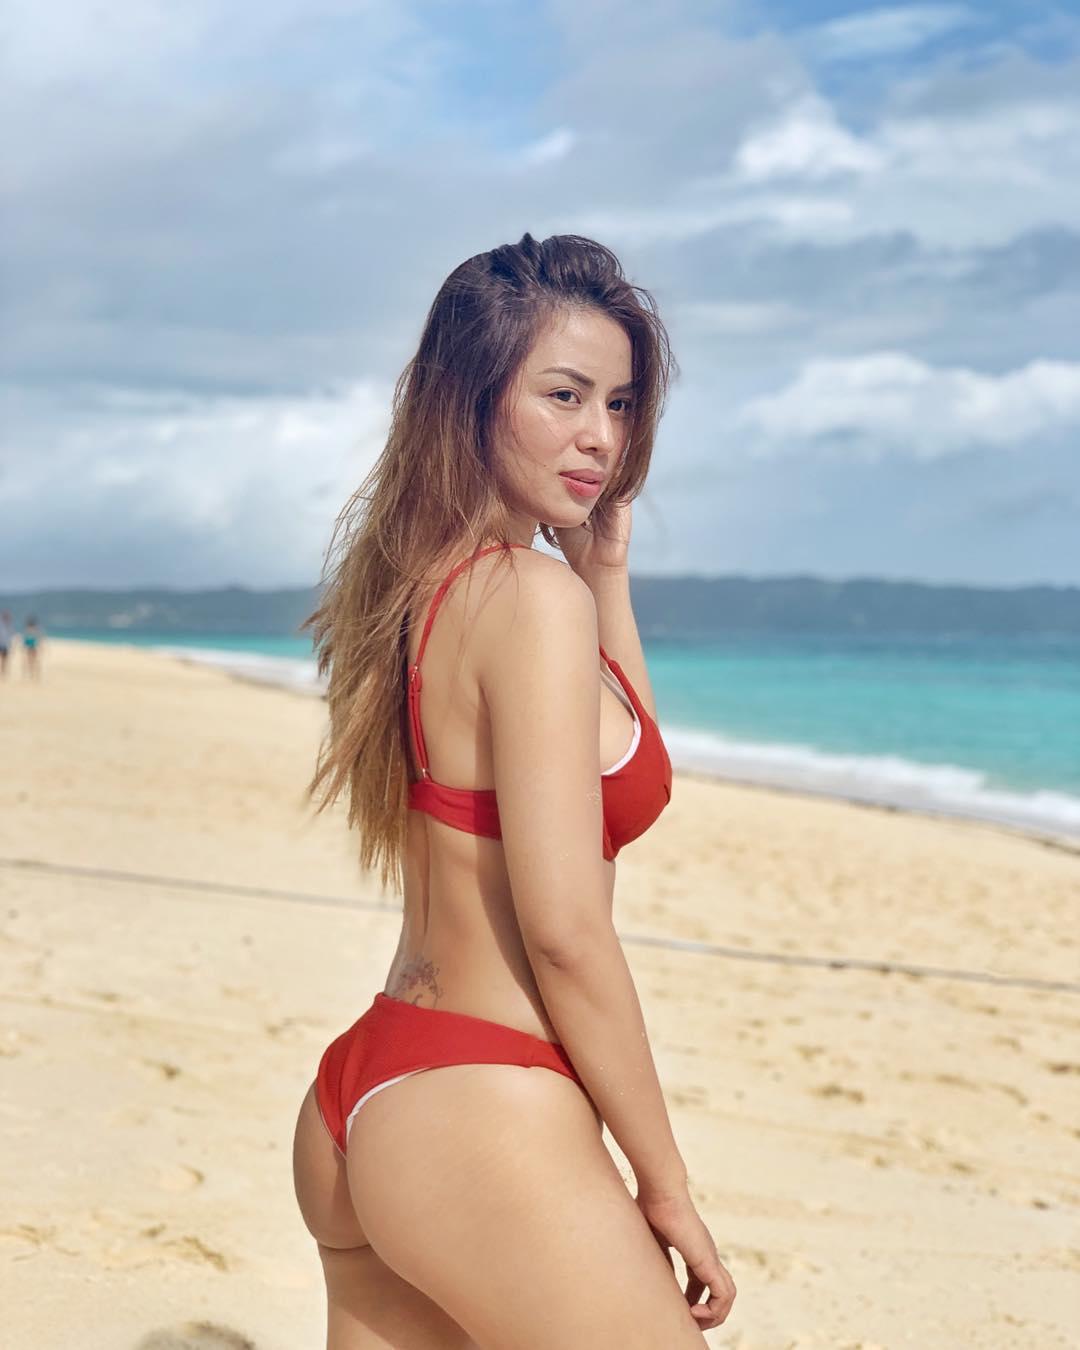 maica palo sexy bikini pics 02